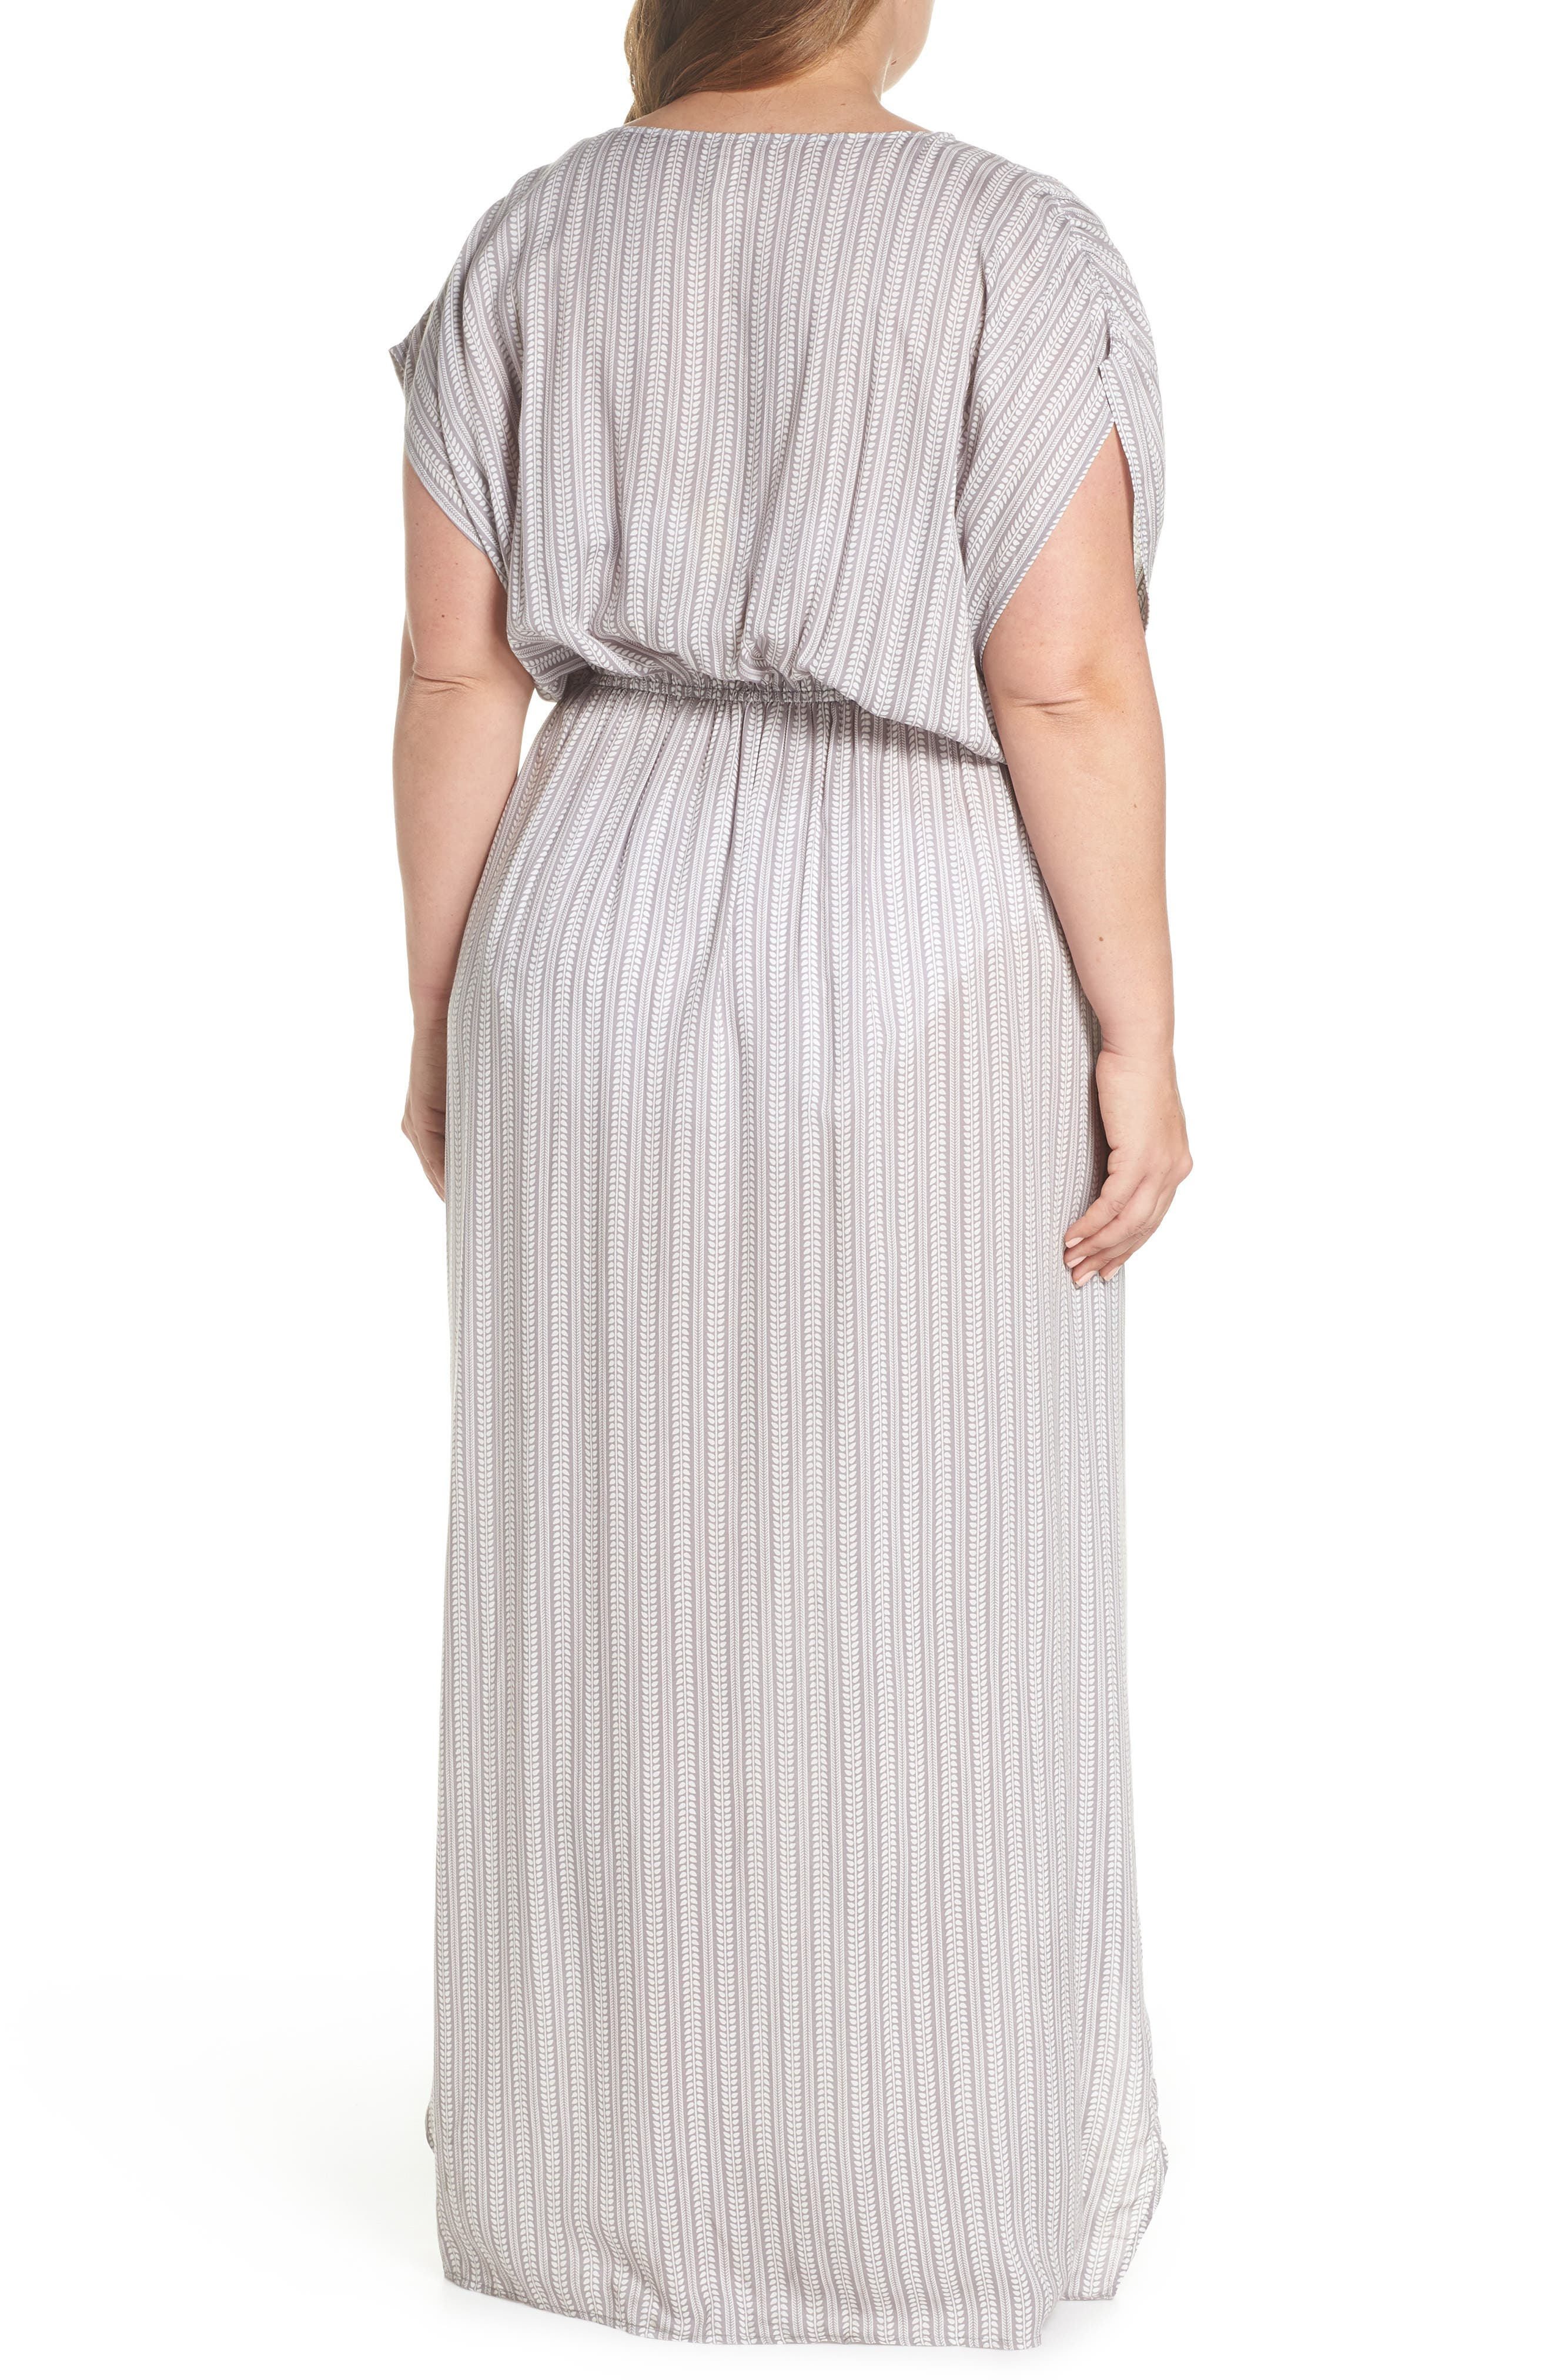 Wrap Maxi Cover-Up Dress,                             Alternate thumbnail 2, color,                             Makoto Grey